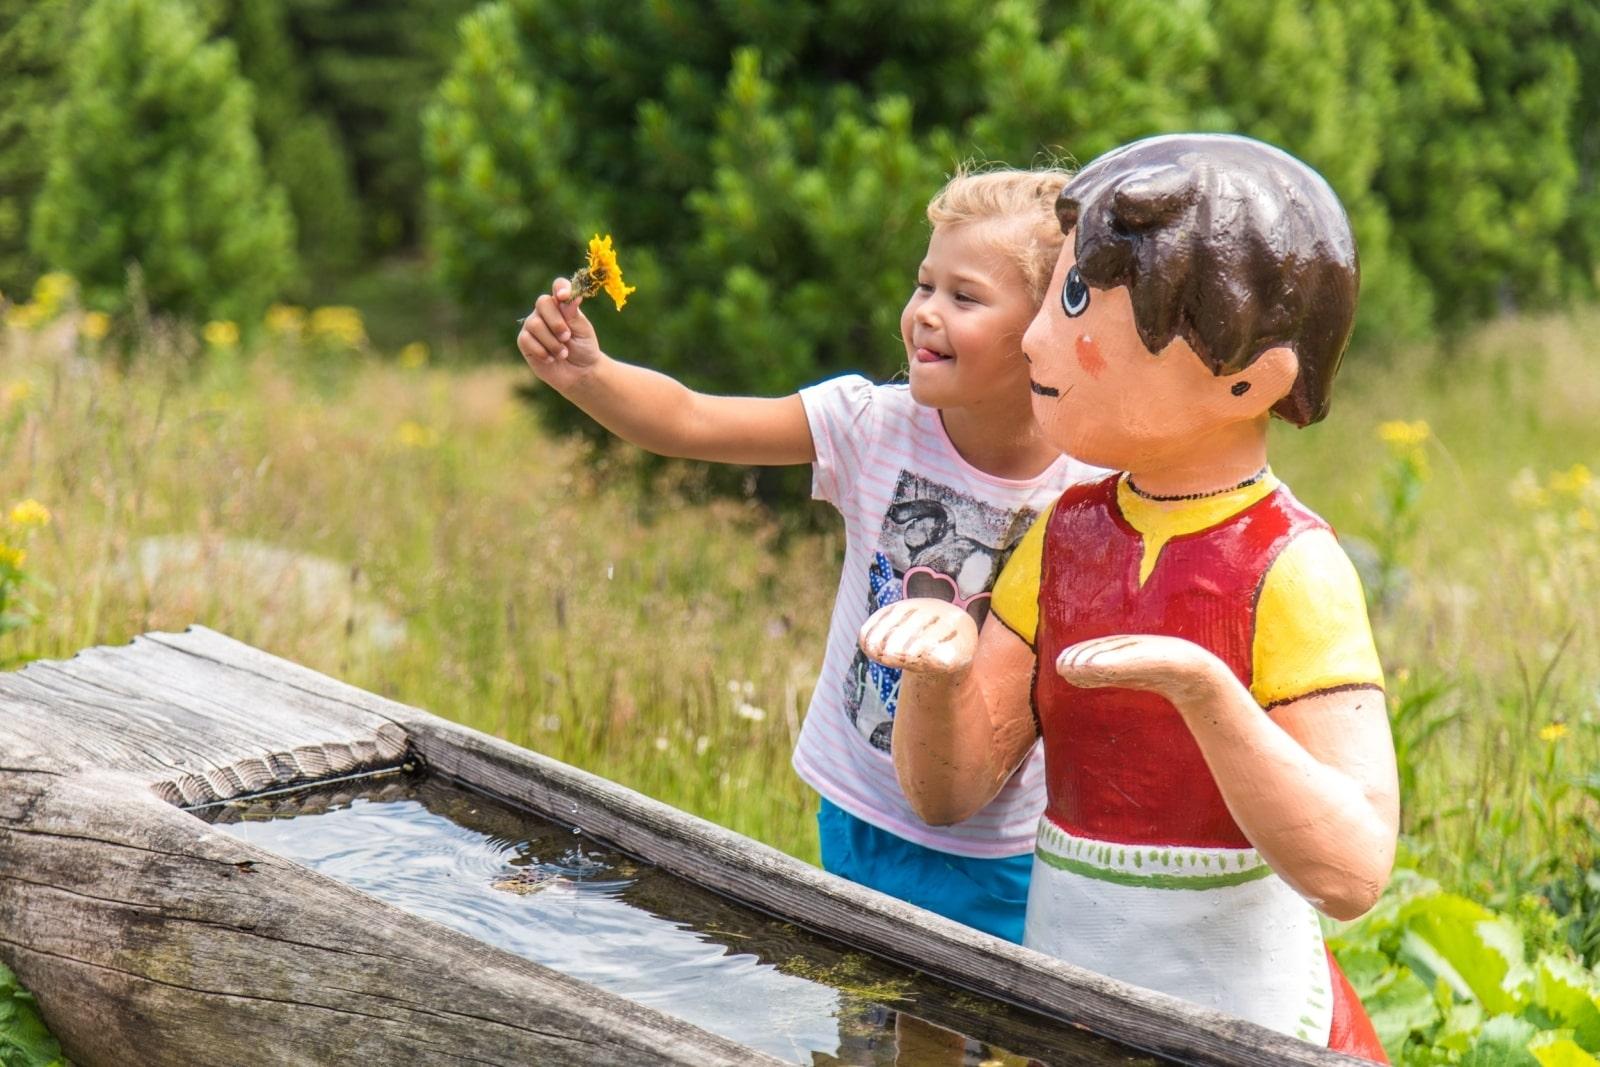 Heidi-Chalet-Falkert-Heidialm-Falkertsee-Kinder-Wasser